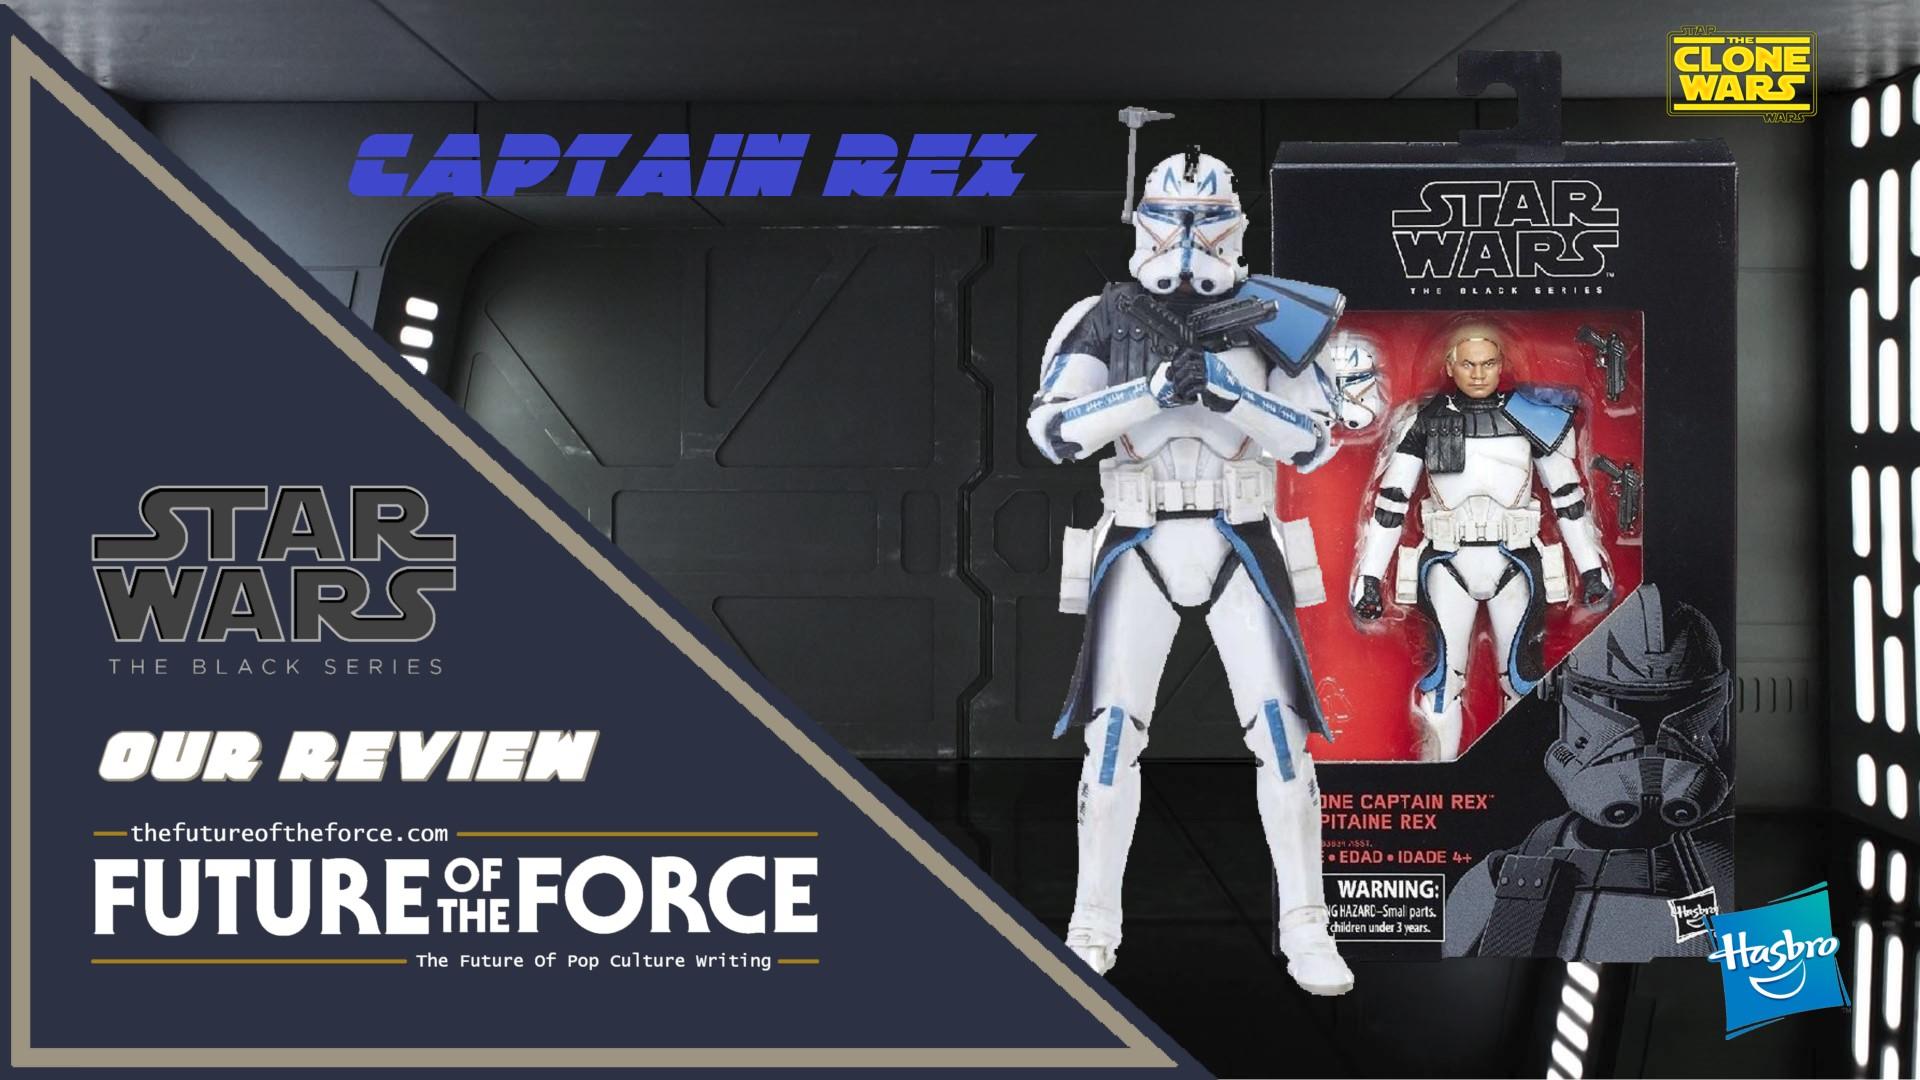 APRIL//21 Star Wars The Black Series Bo-Katan Kryze 6/' Action Figure PRE ORDER